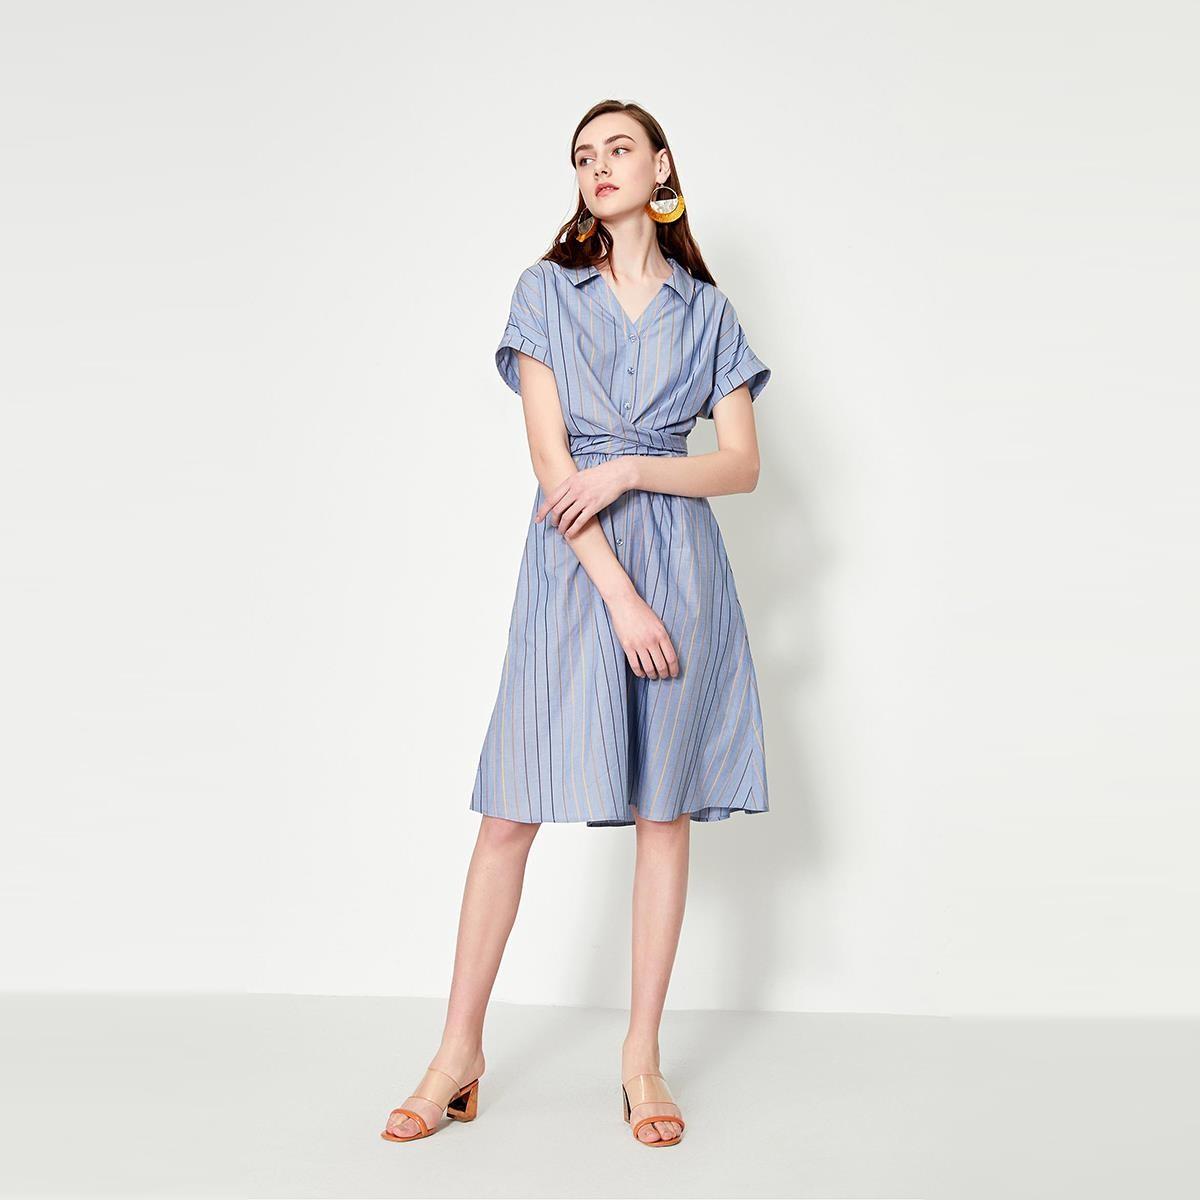 VERO MODA |31937B516 女士连衣裙